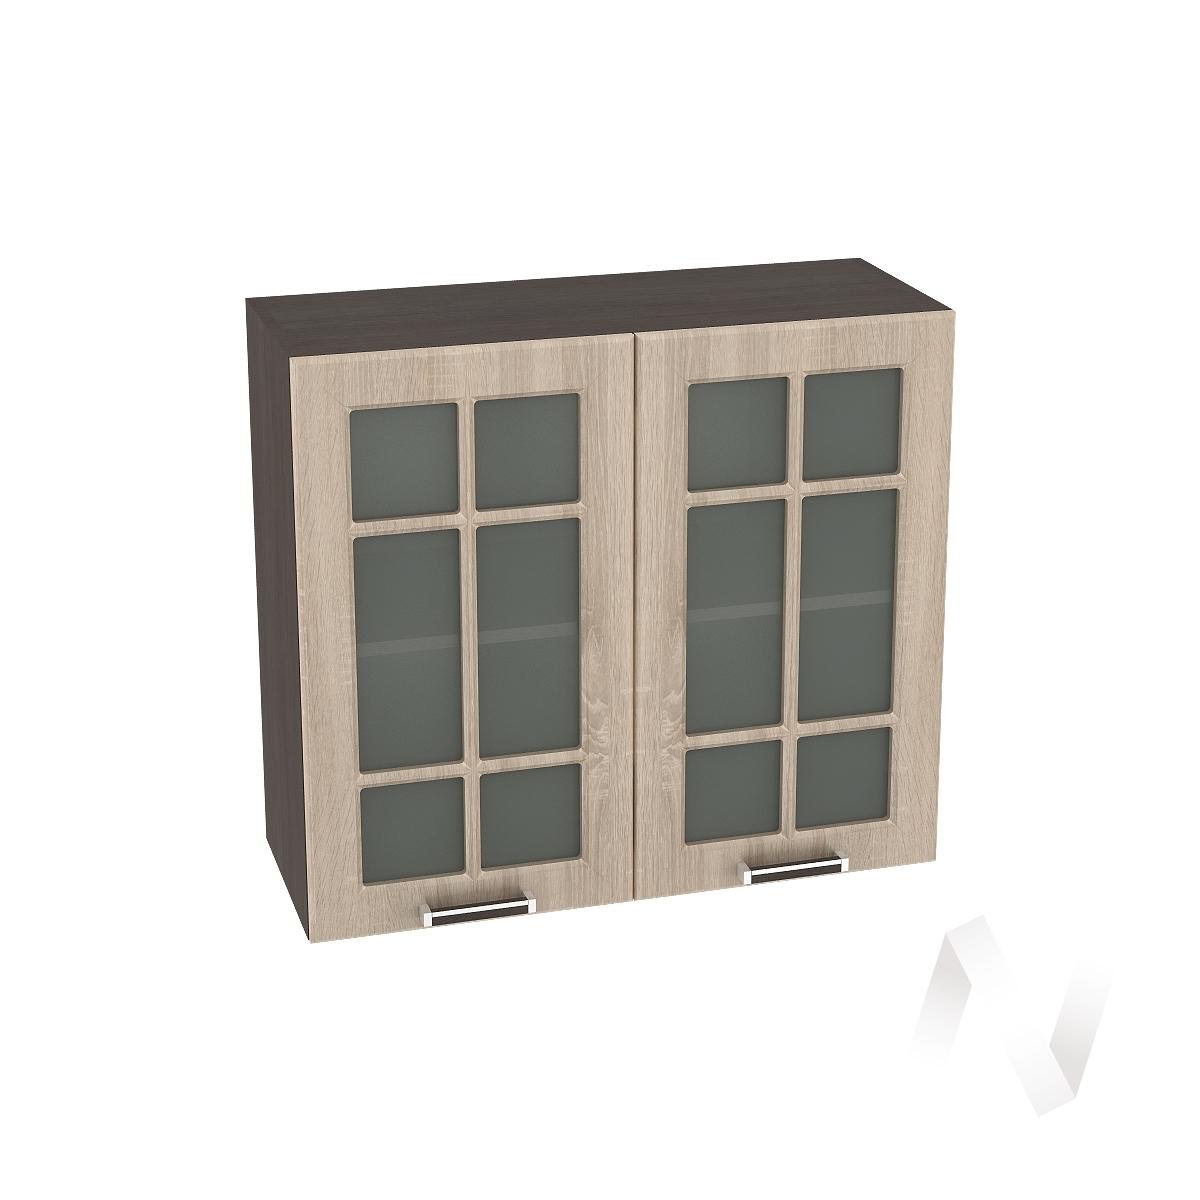 "Кухня ""Прага"": Шкаф верхний со стеклом 800, ШВС 800 (дуб сонома/корпус венге)"